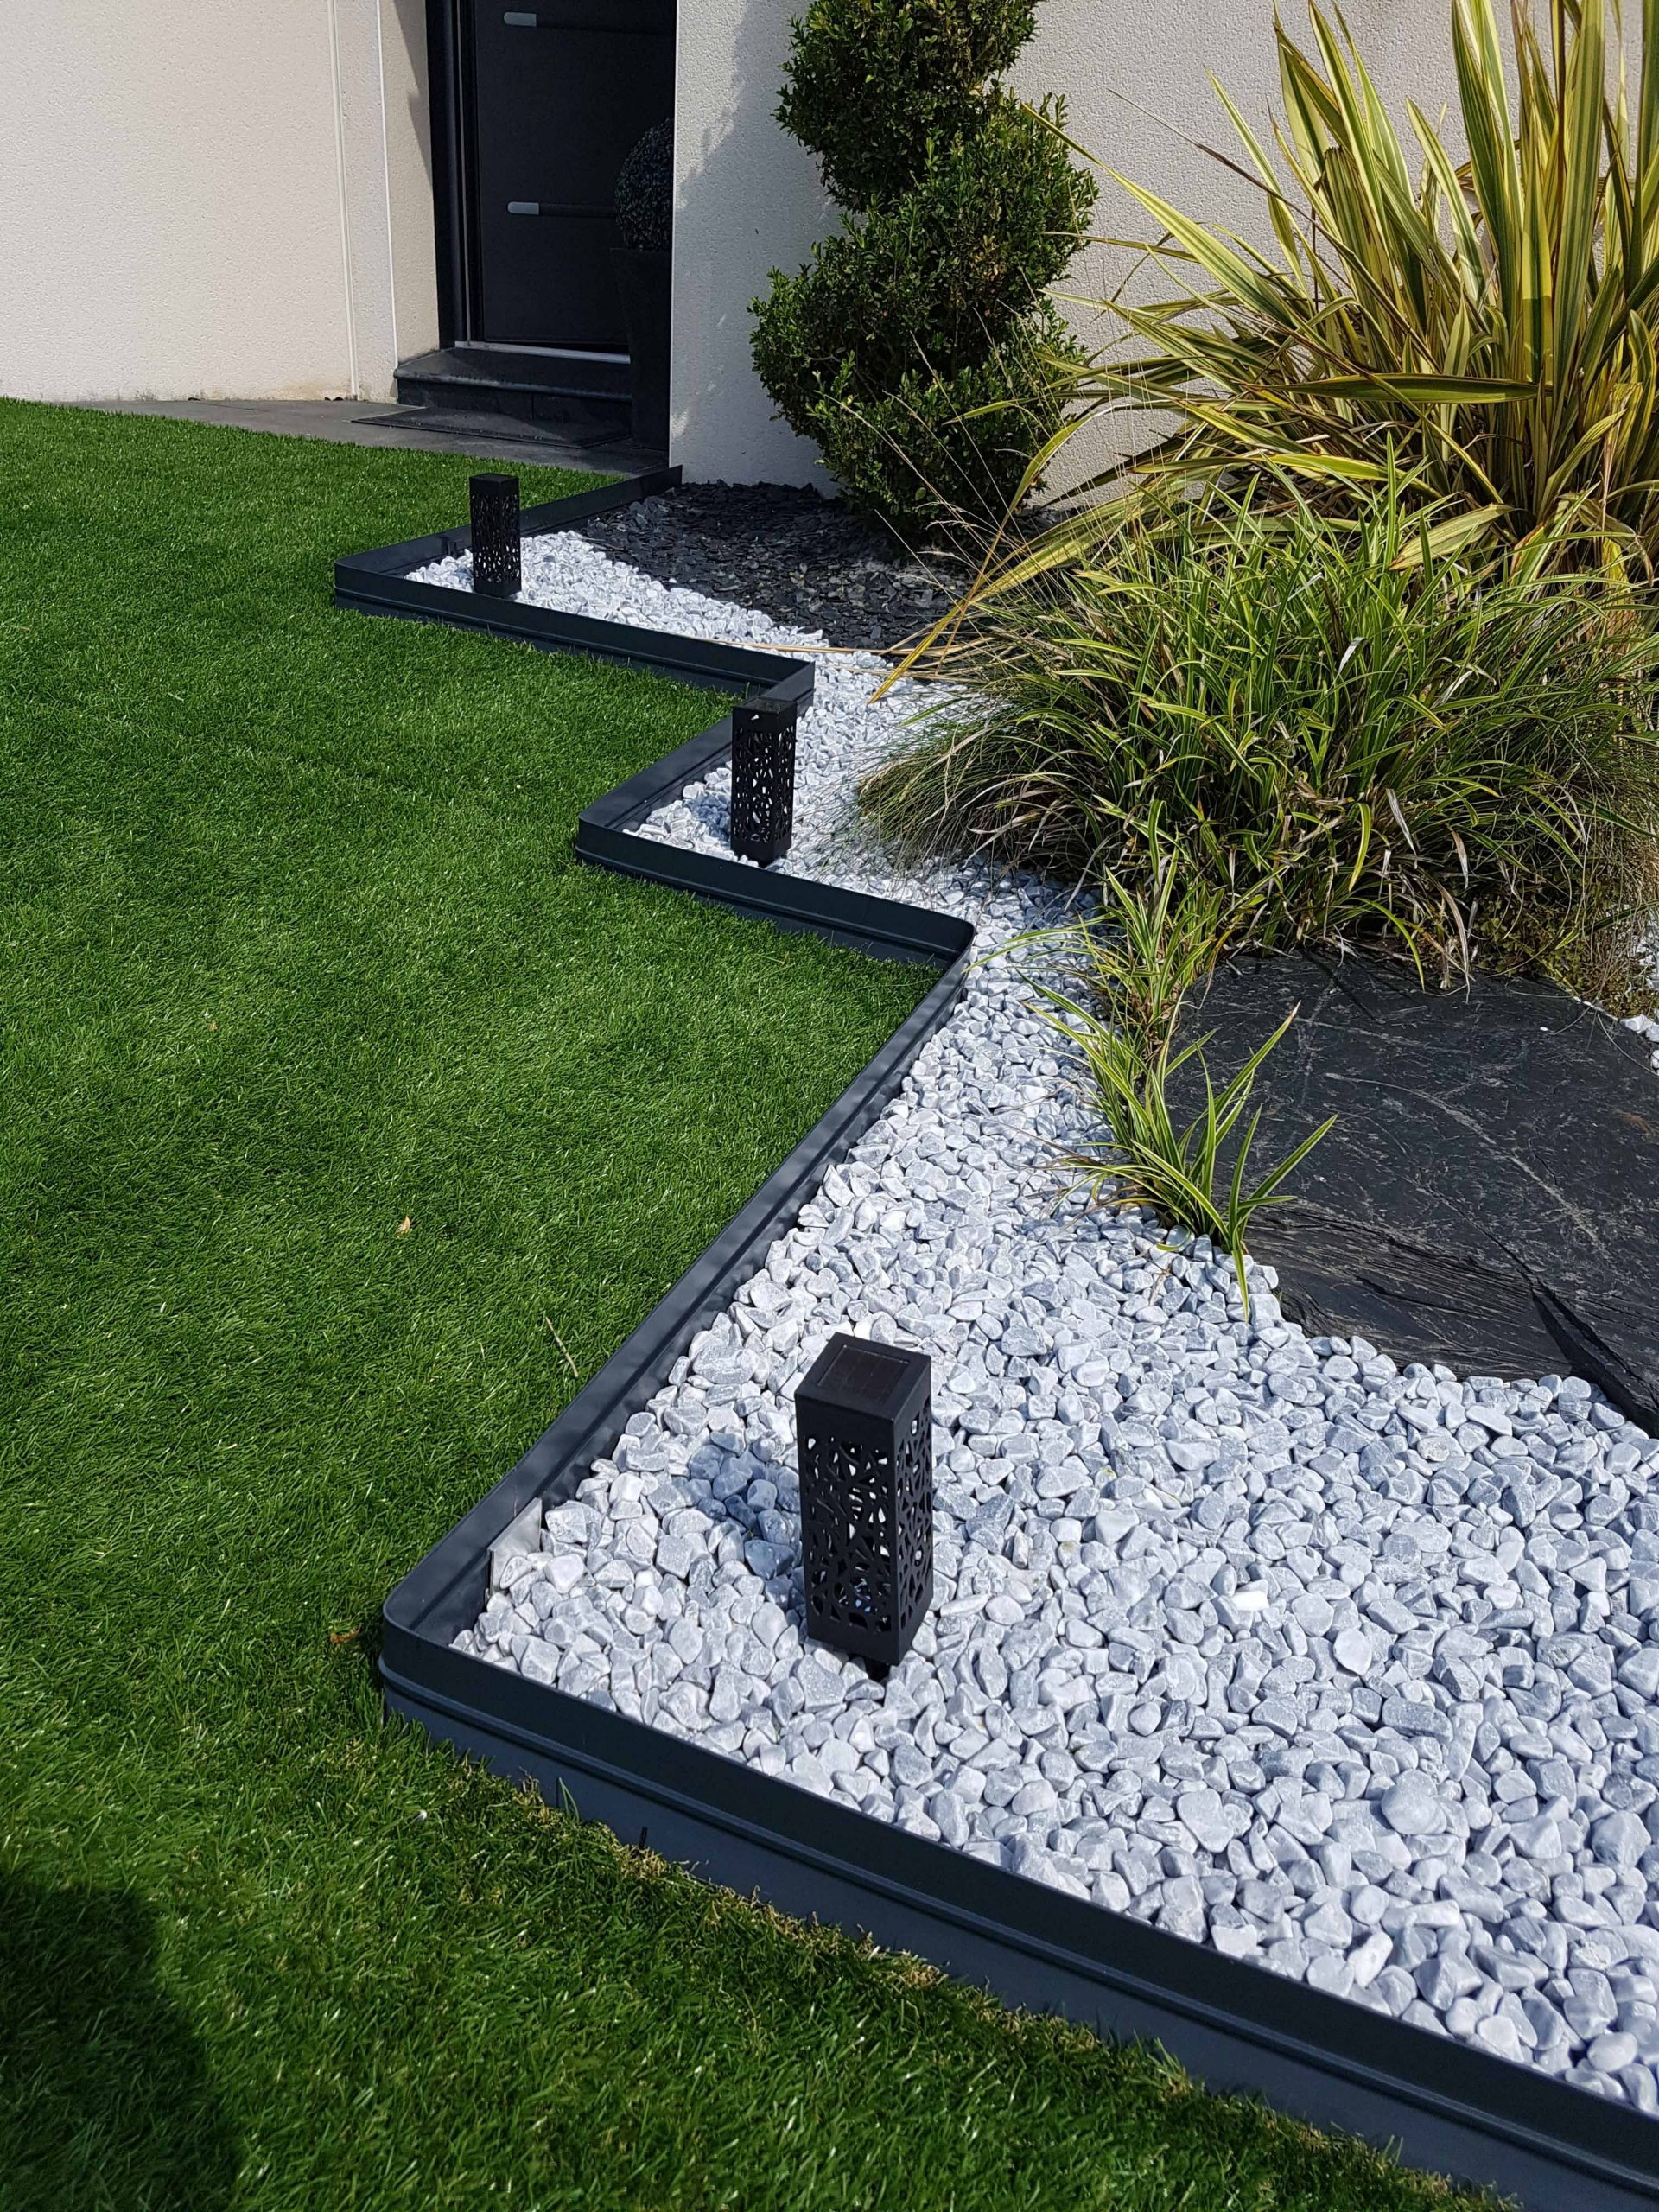 Bordure Bordalu Gris Anthracite | Bordure Terrasse, Bordure ... destiné Bordure Jardin